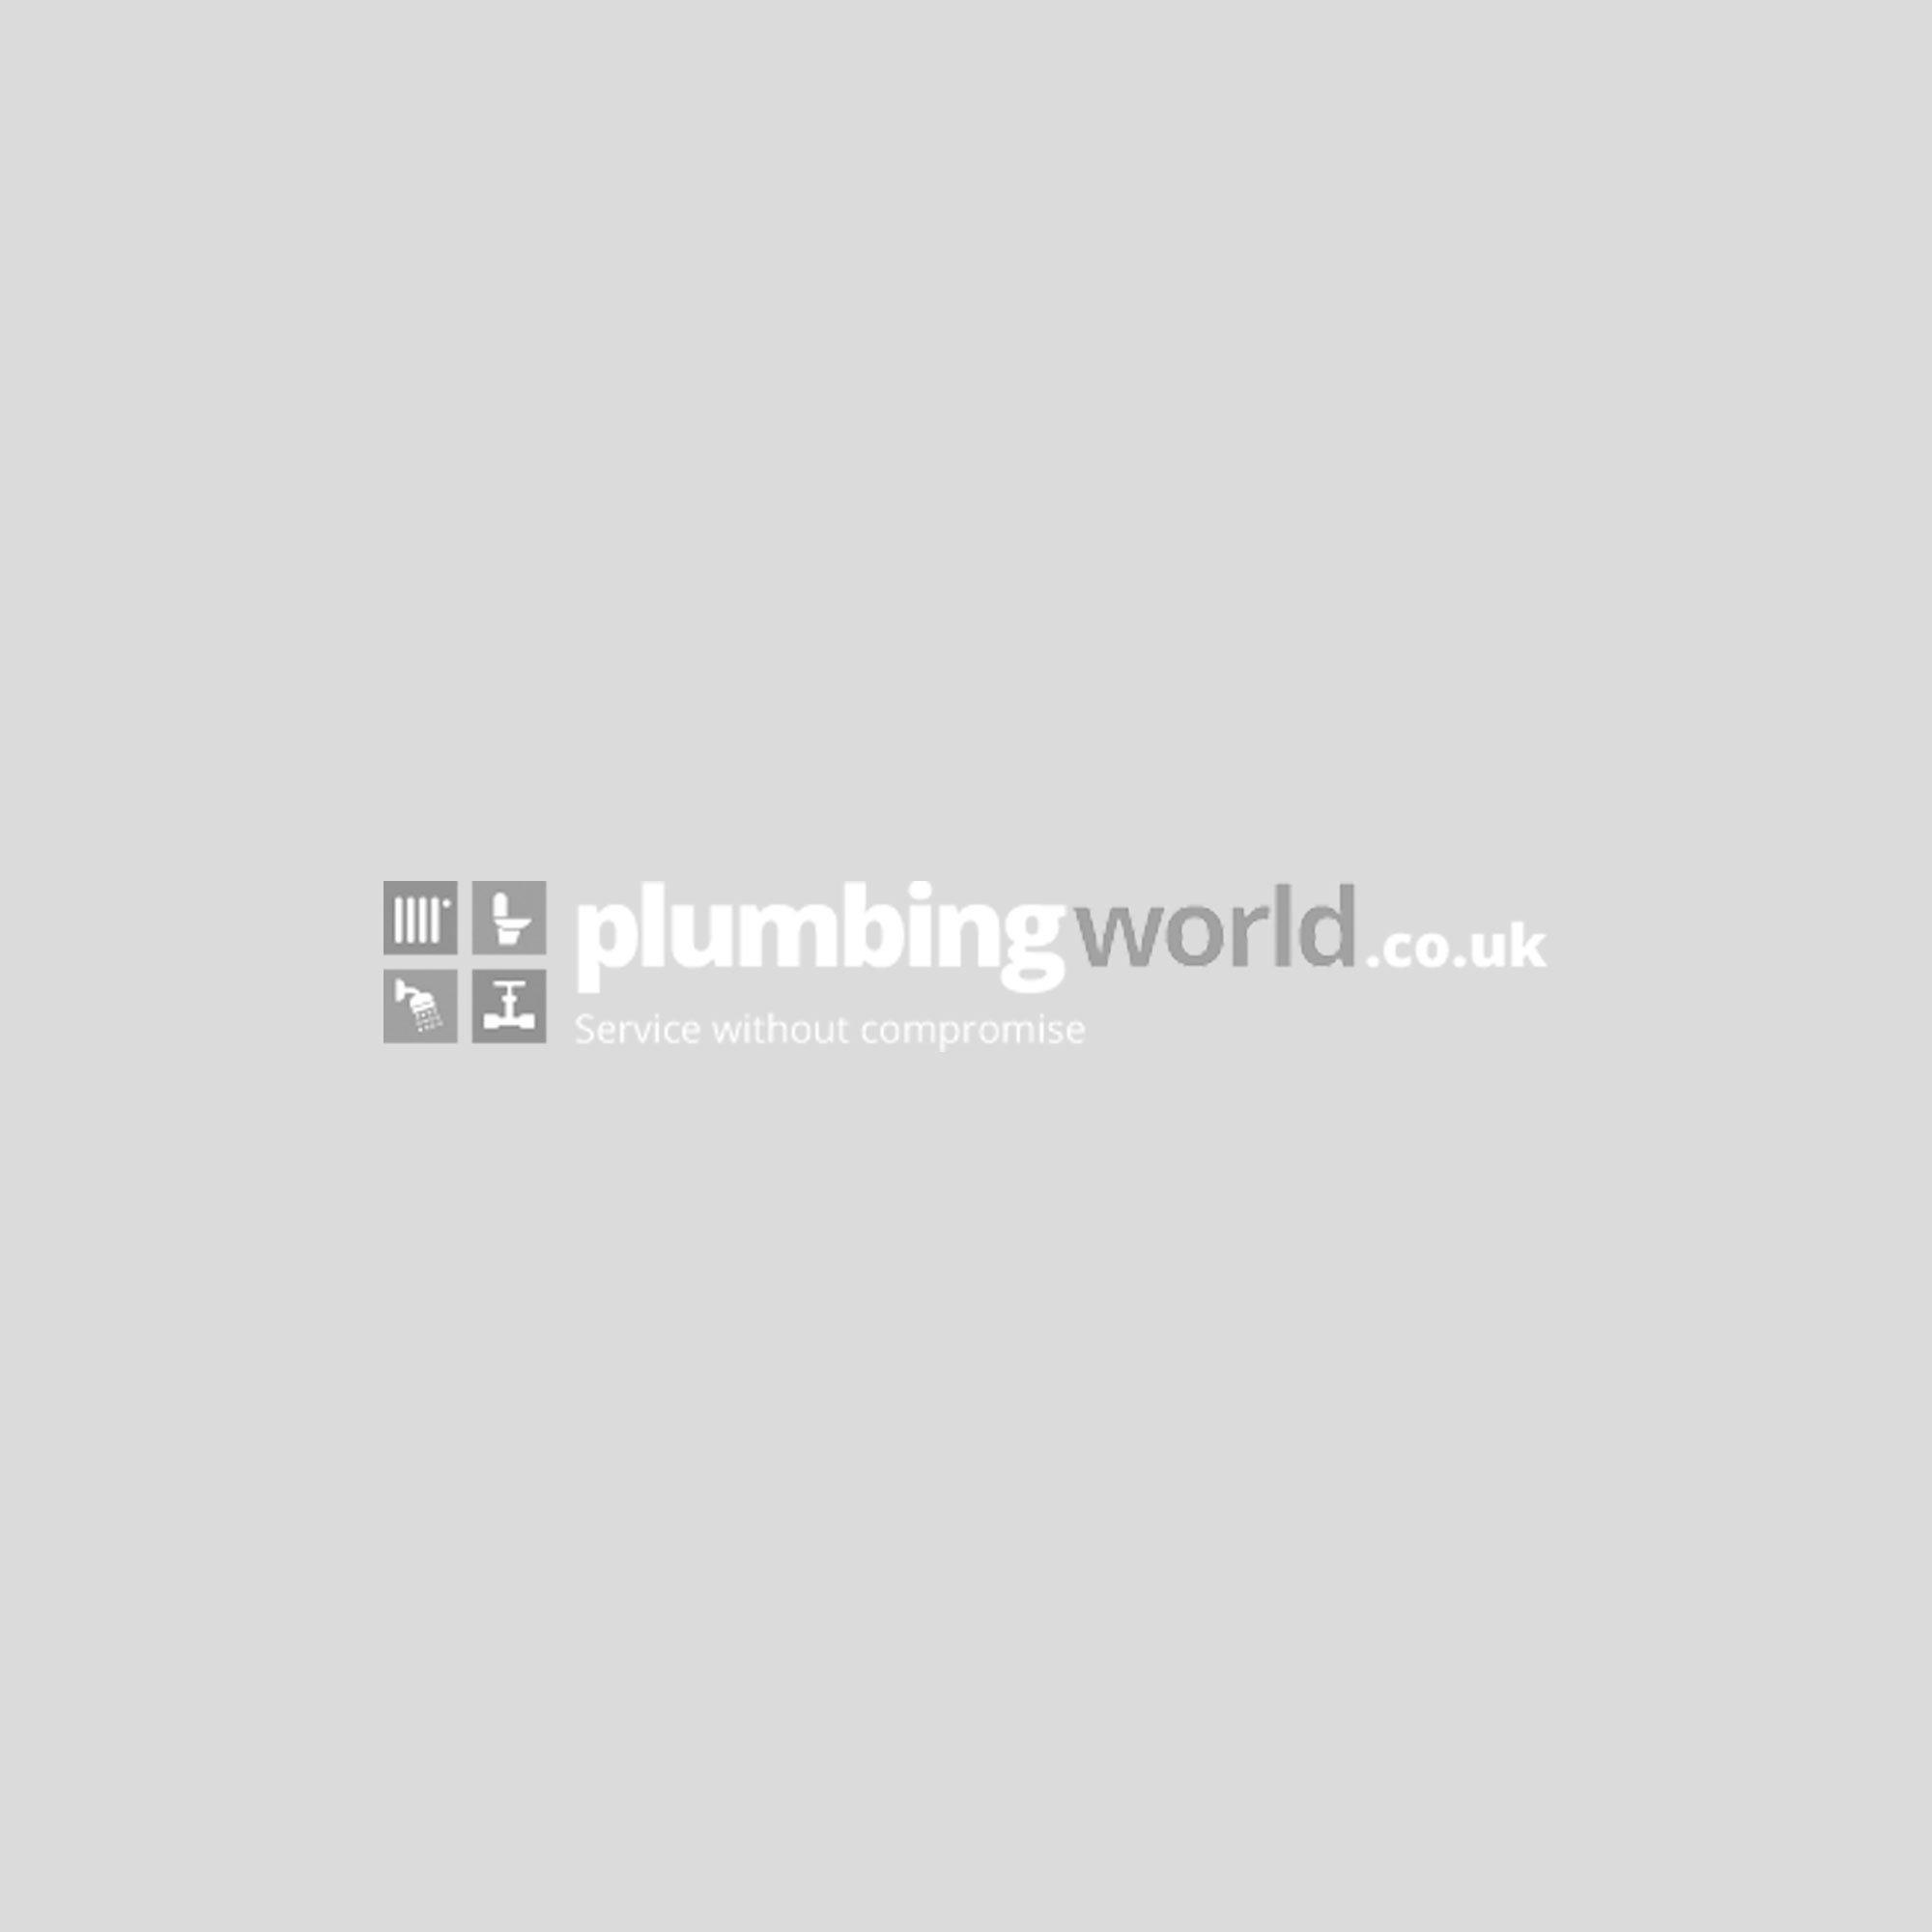 Aqua-I Wetroom 10mm Tile Backer Board For Walls and Floors 1200mm x 600mm (10 Pack)